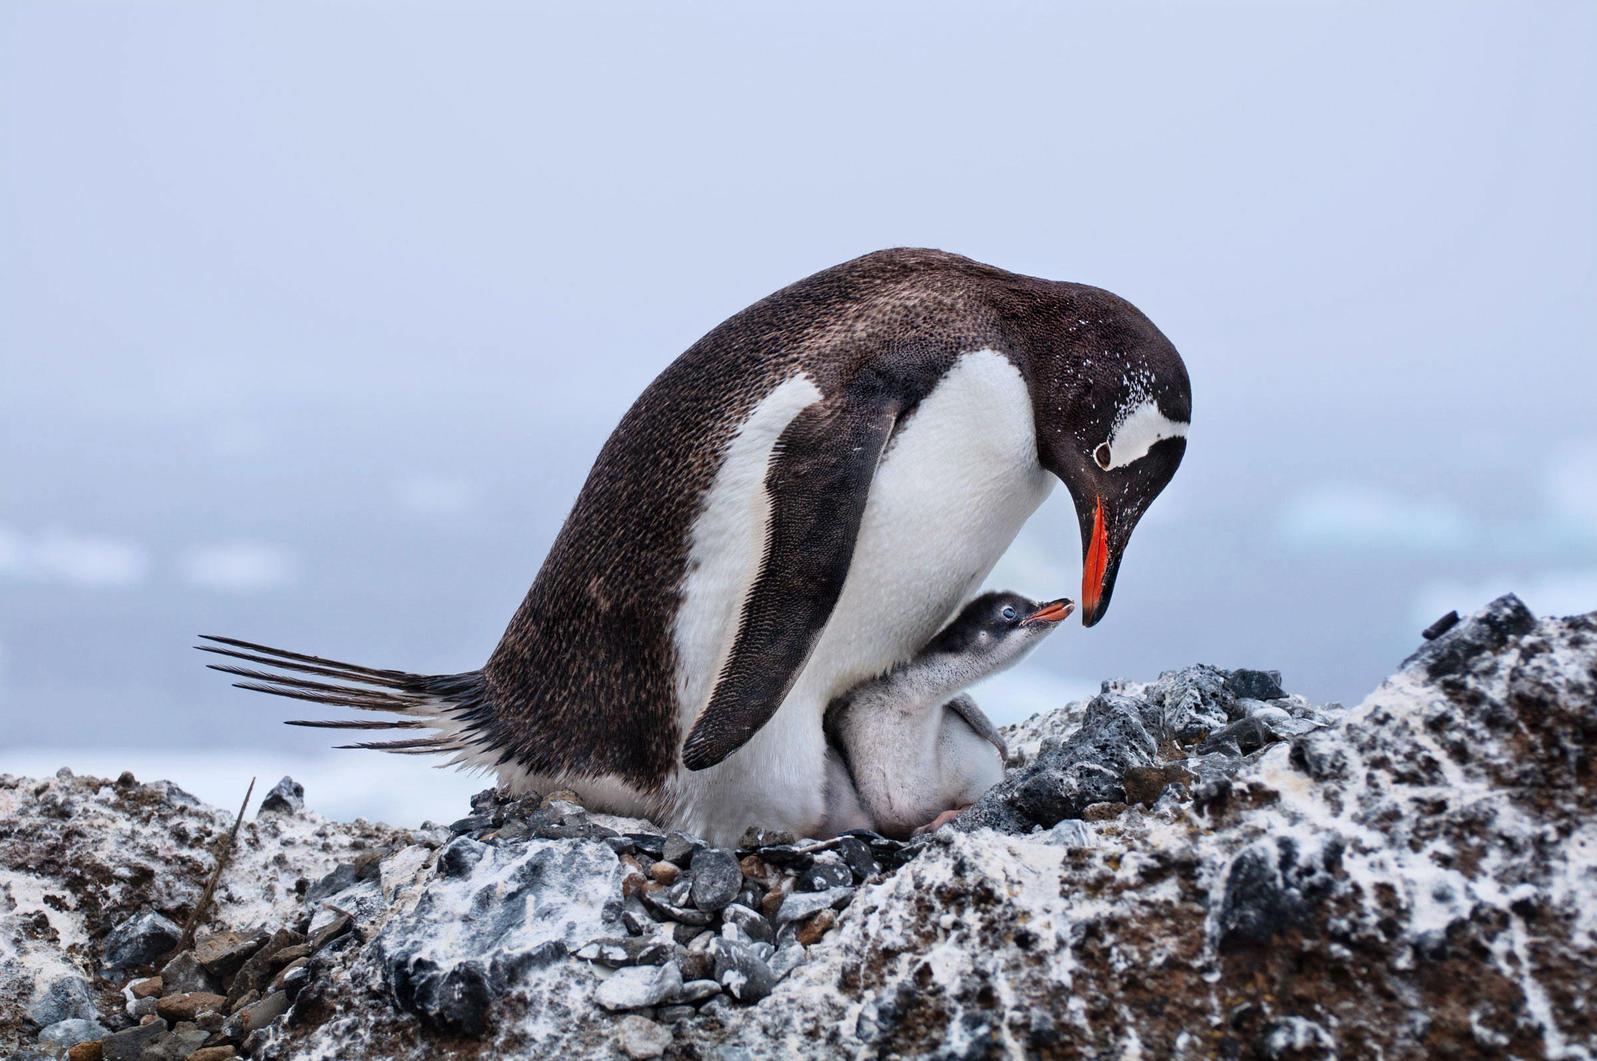 Gentoo Penguin and chick. Deborah Albert/2017 Grand Prize Winner